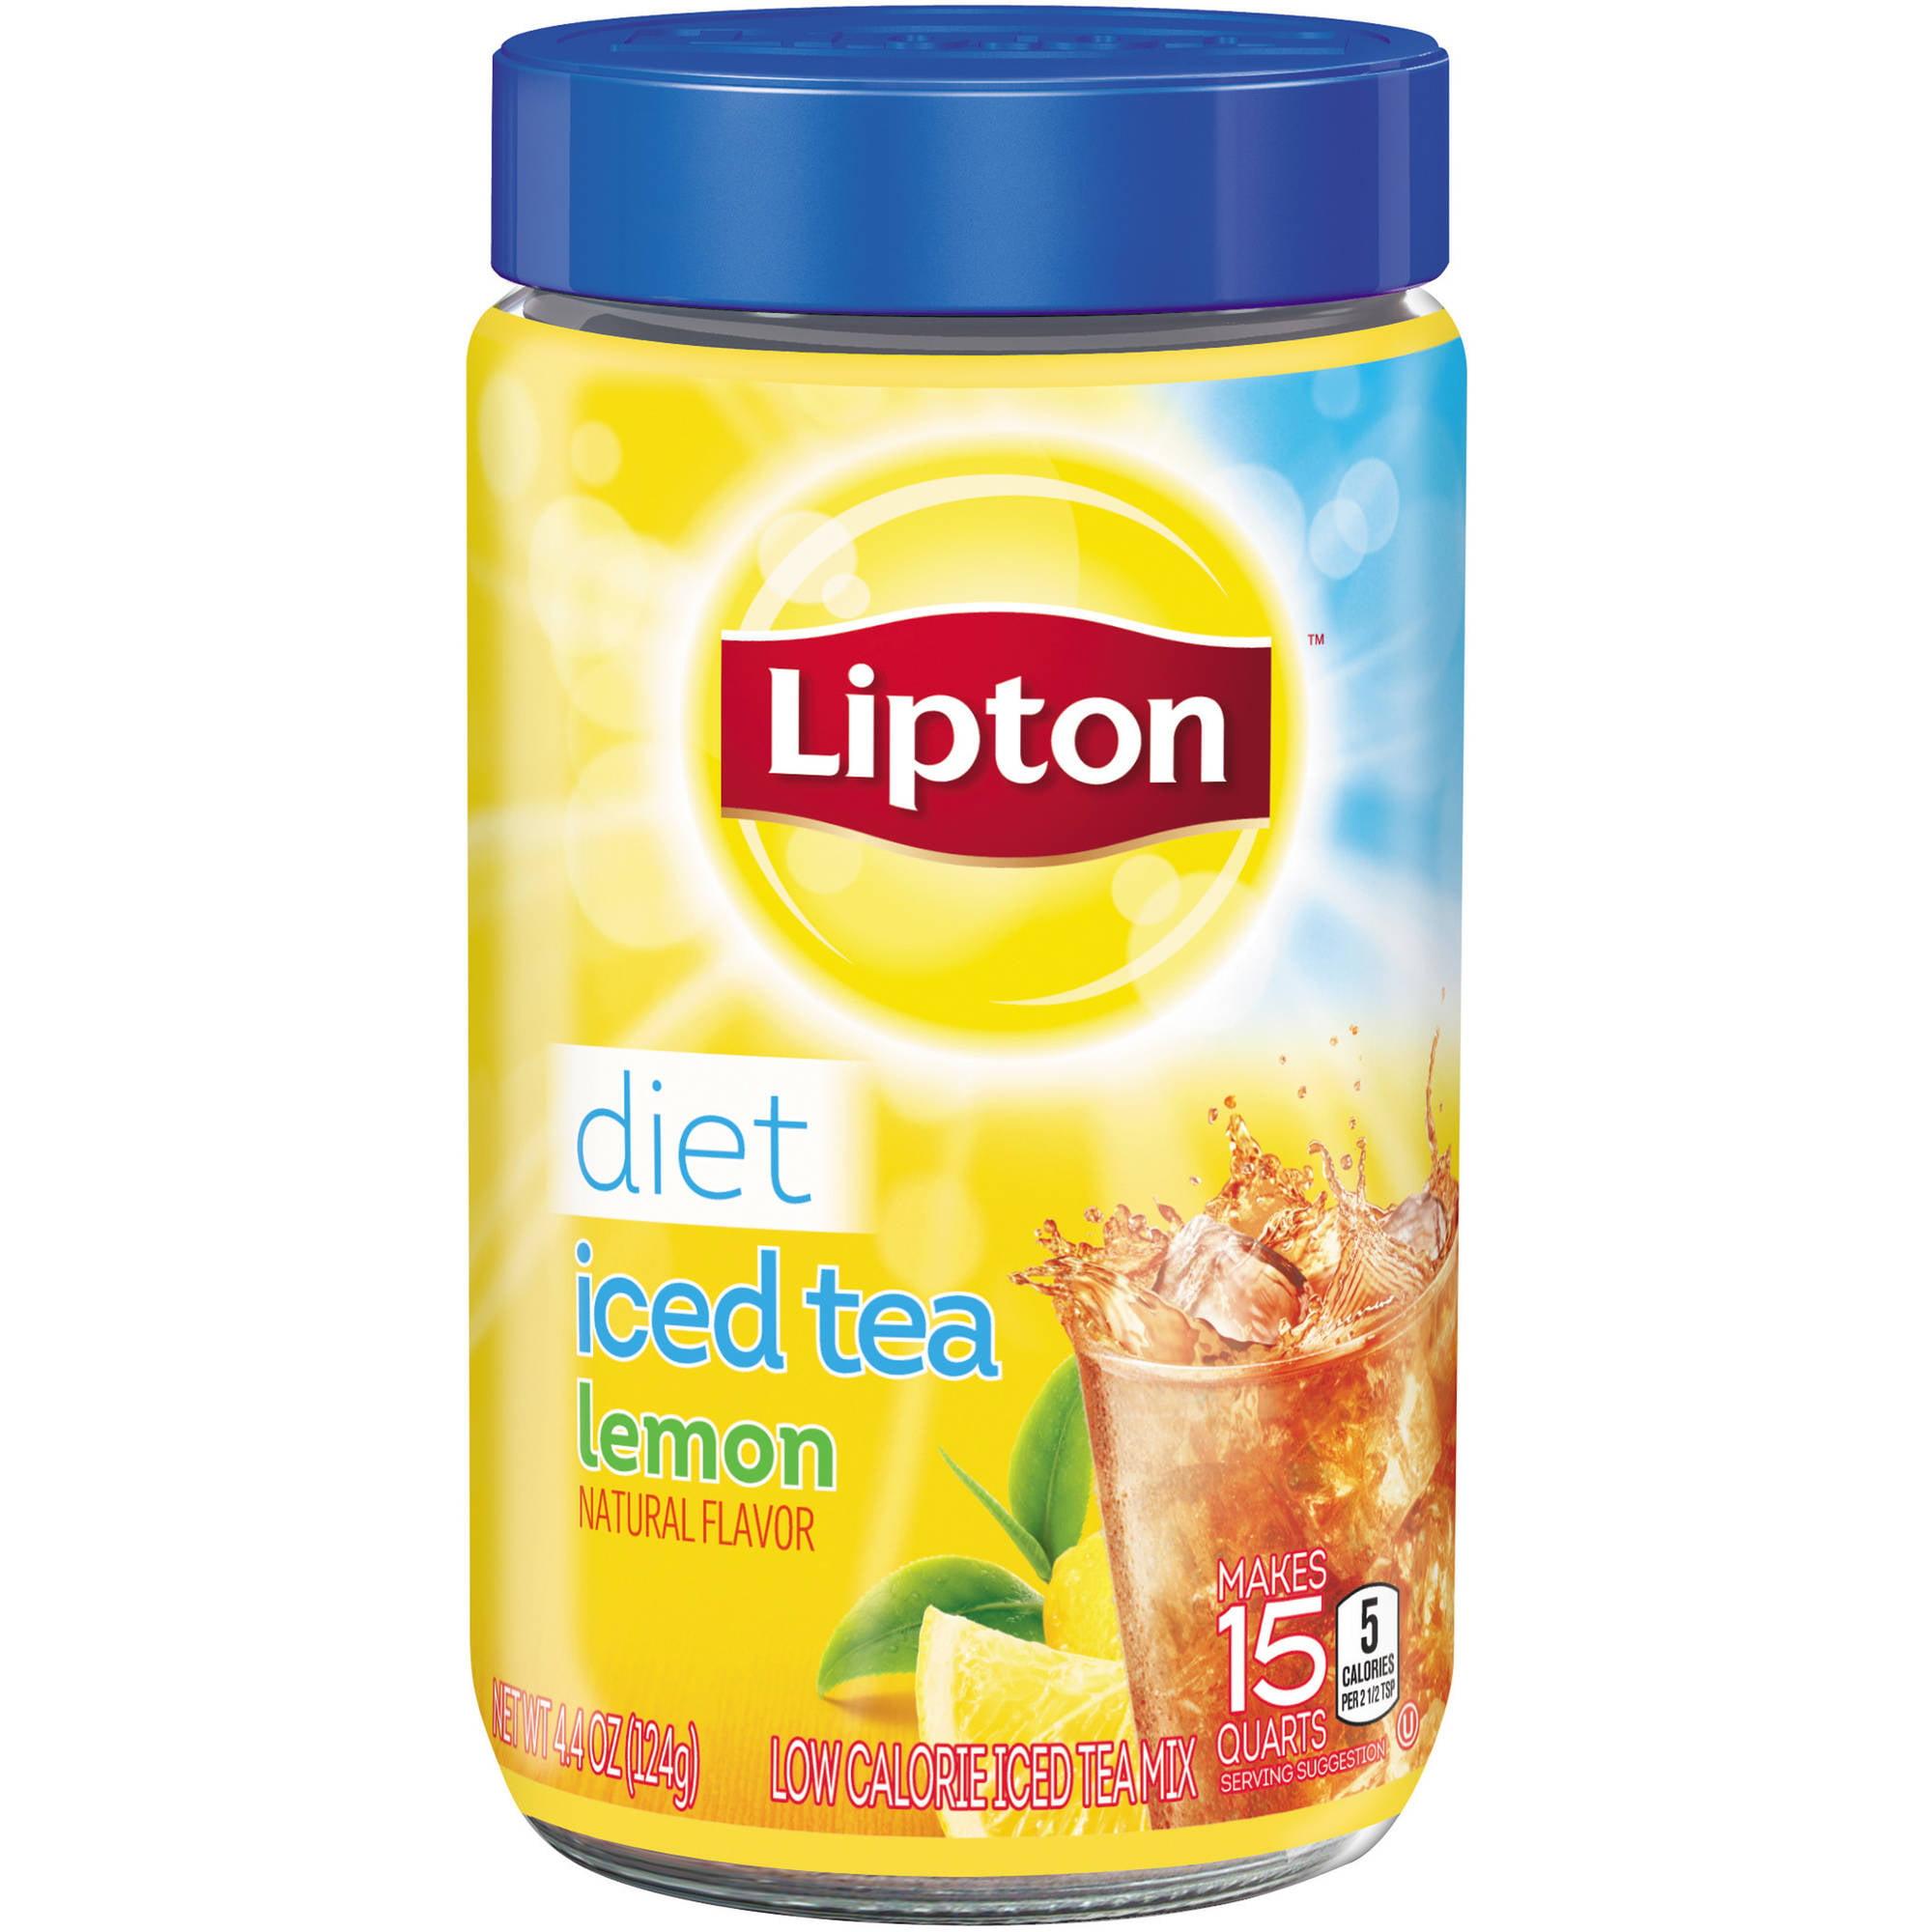 Lipton Diet Lemon Iced Tea Mix, 15 qt